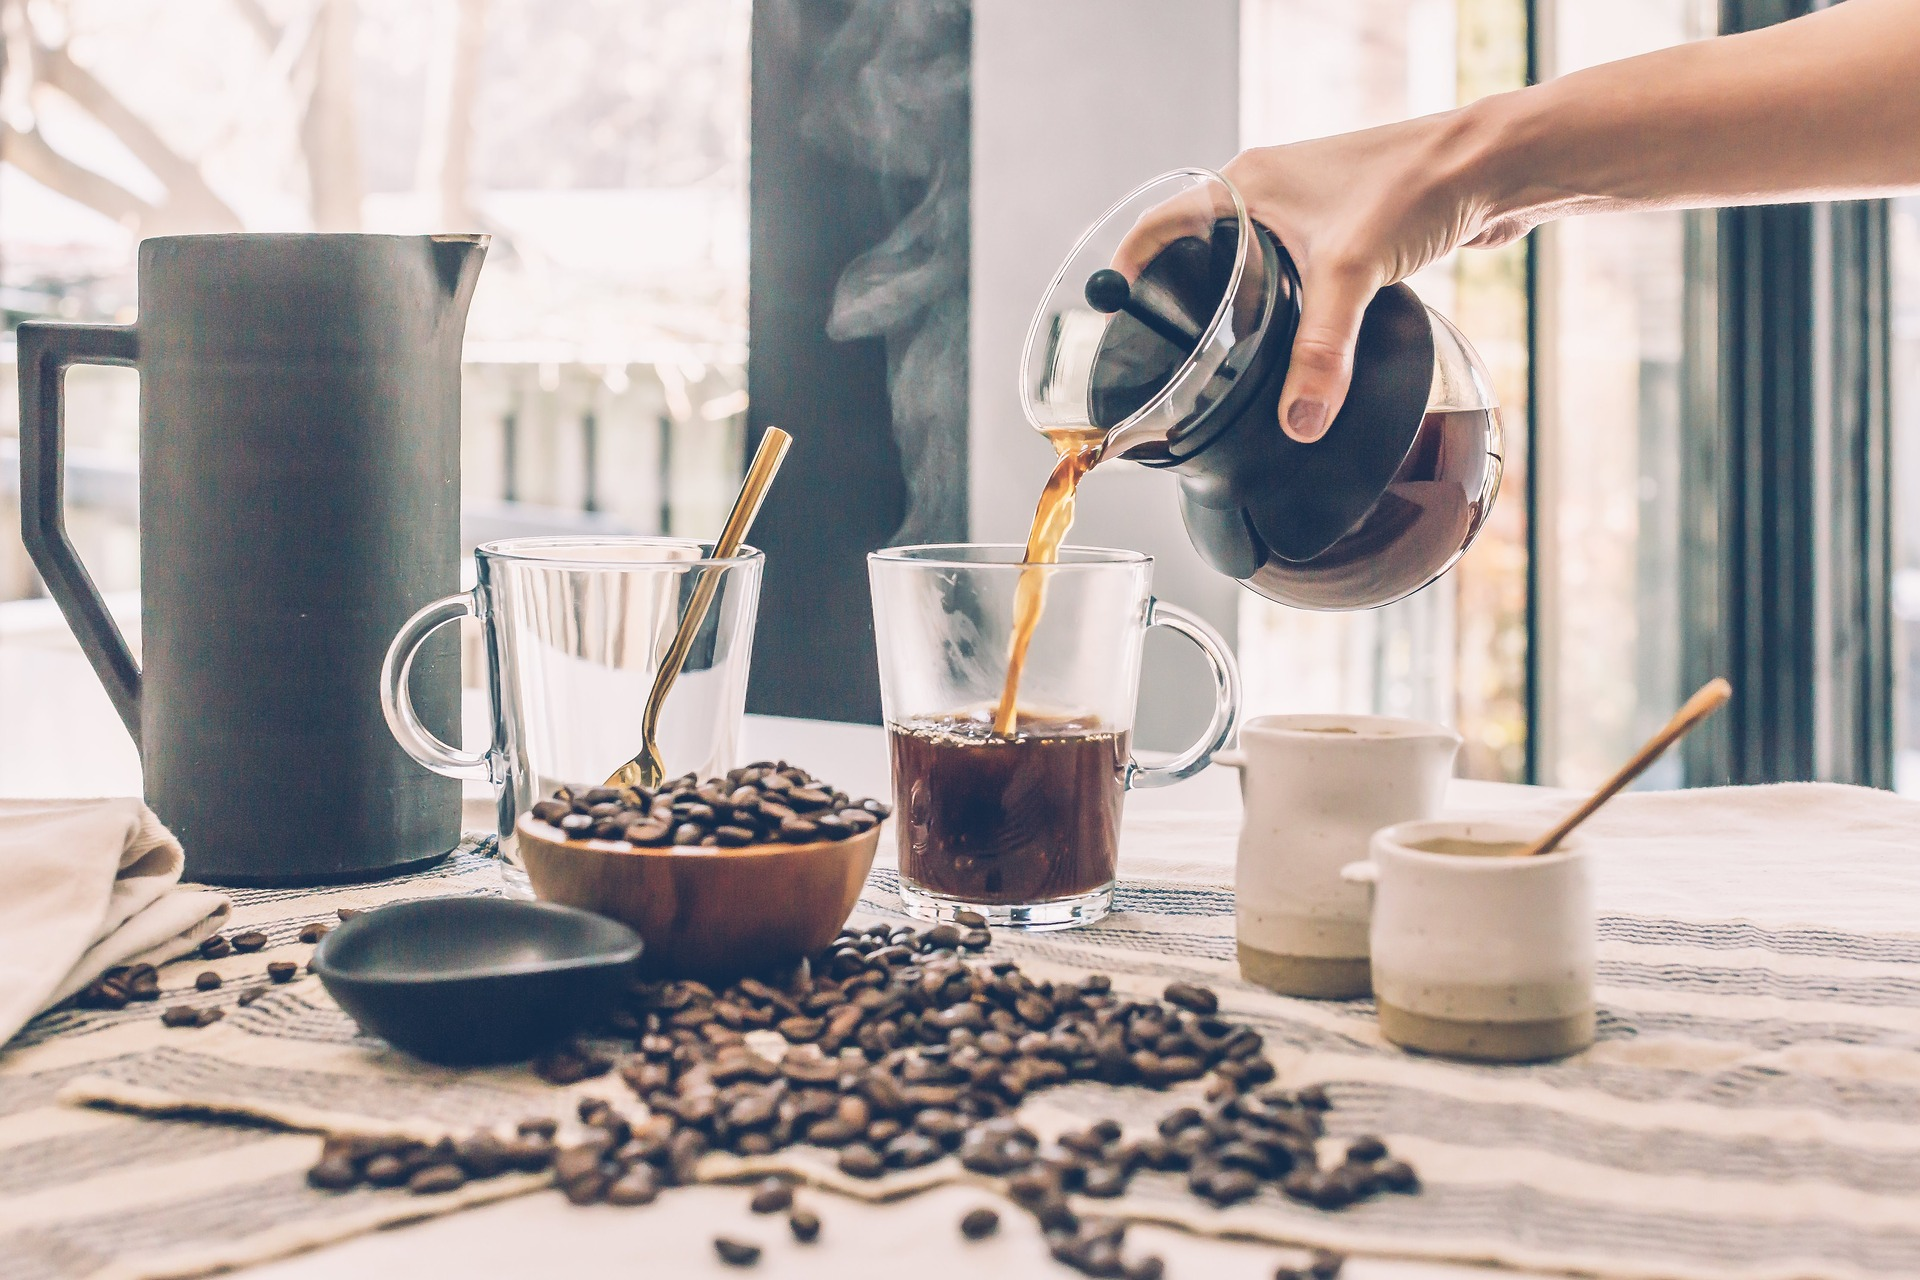 La Caffeina:  Alleata o nemica?